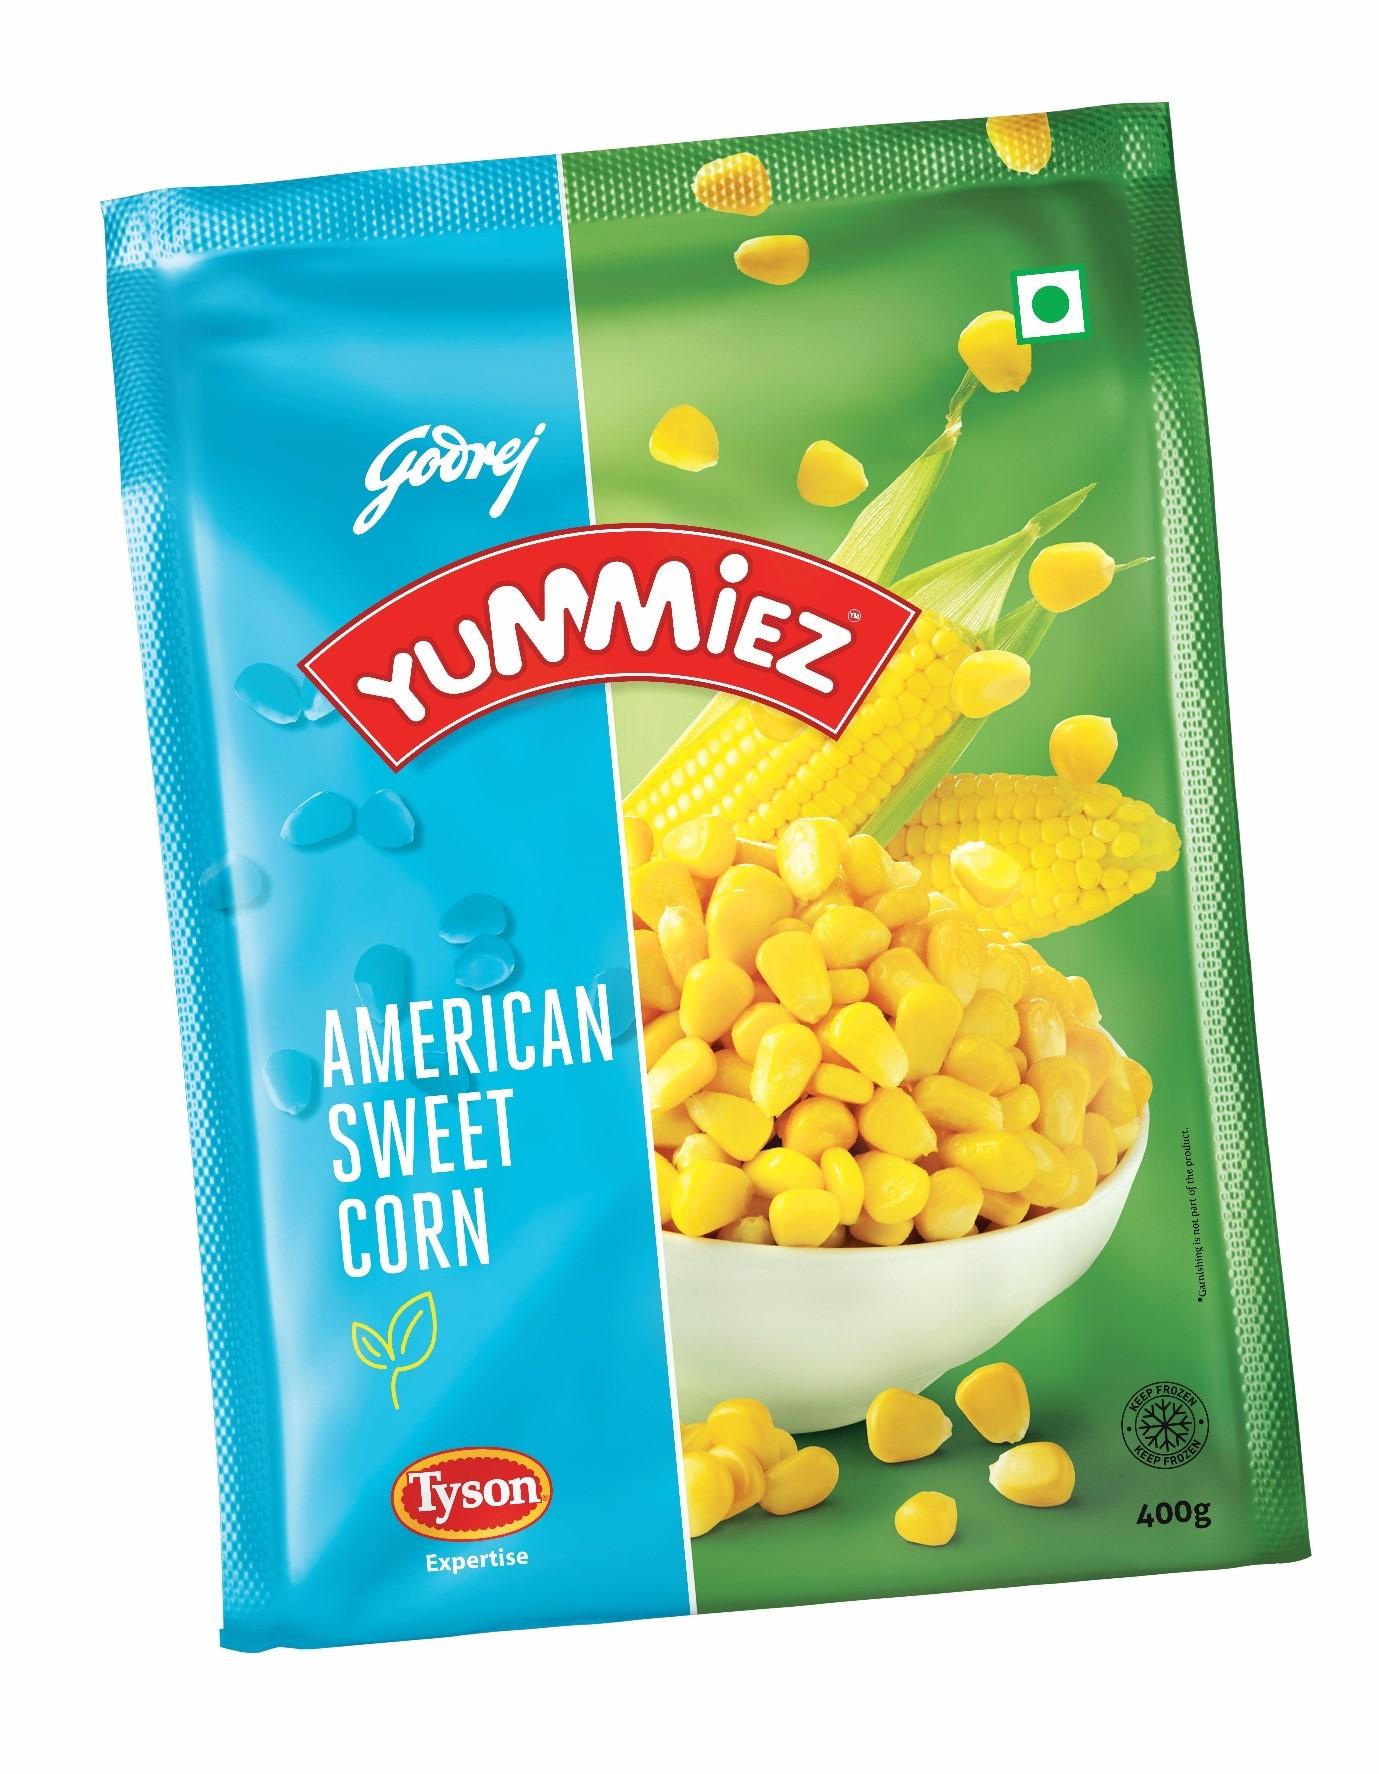 Yummiez American Sweet Corn 400 g